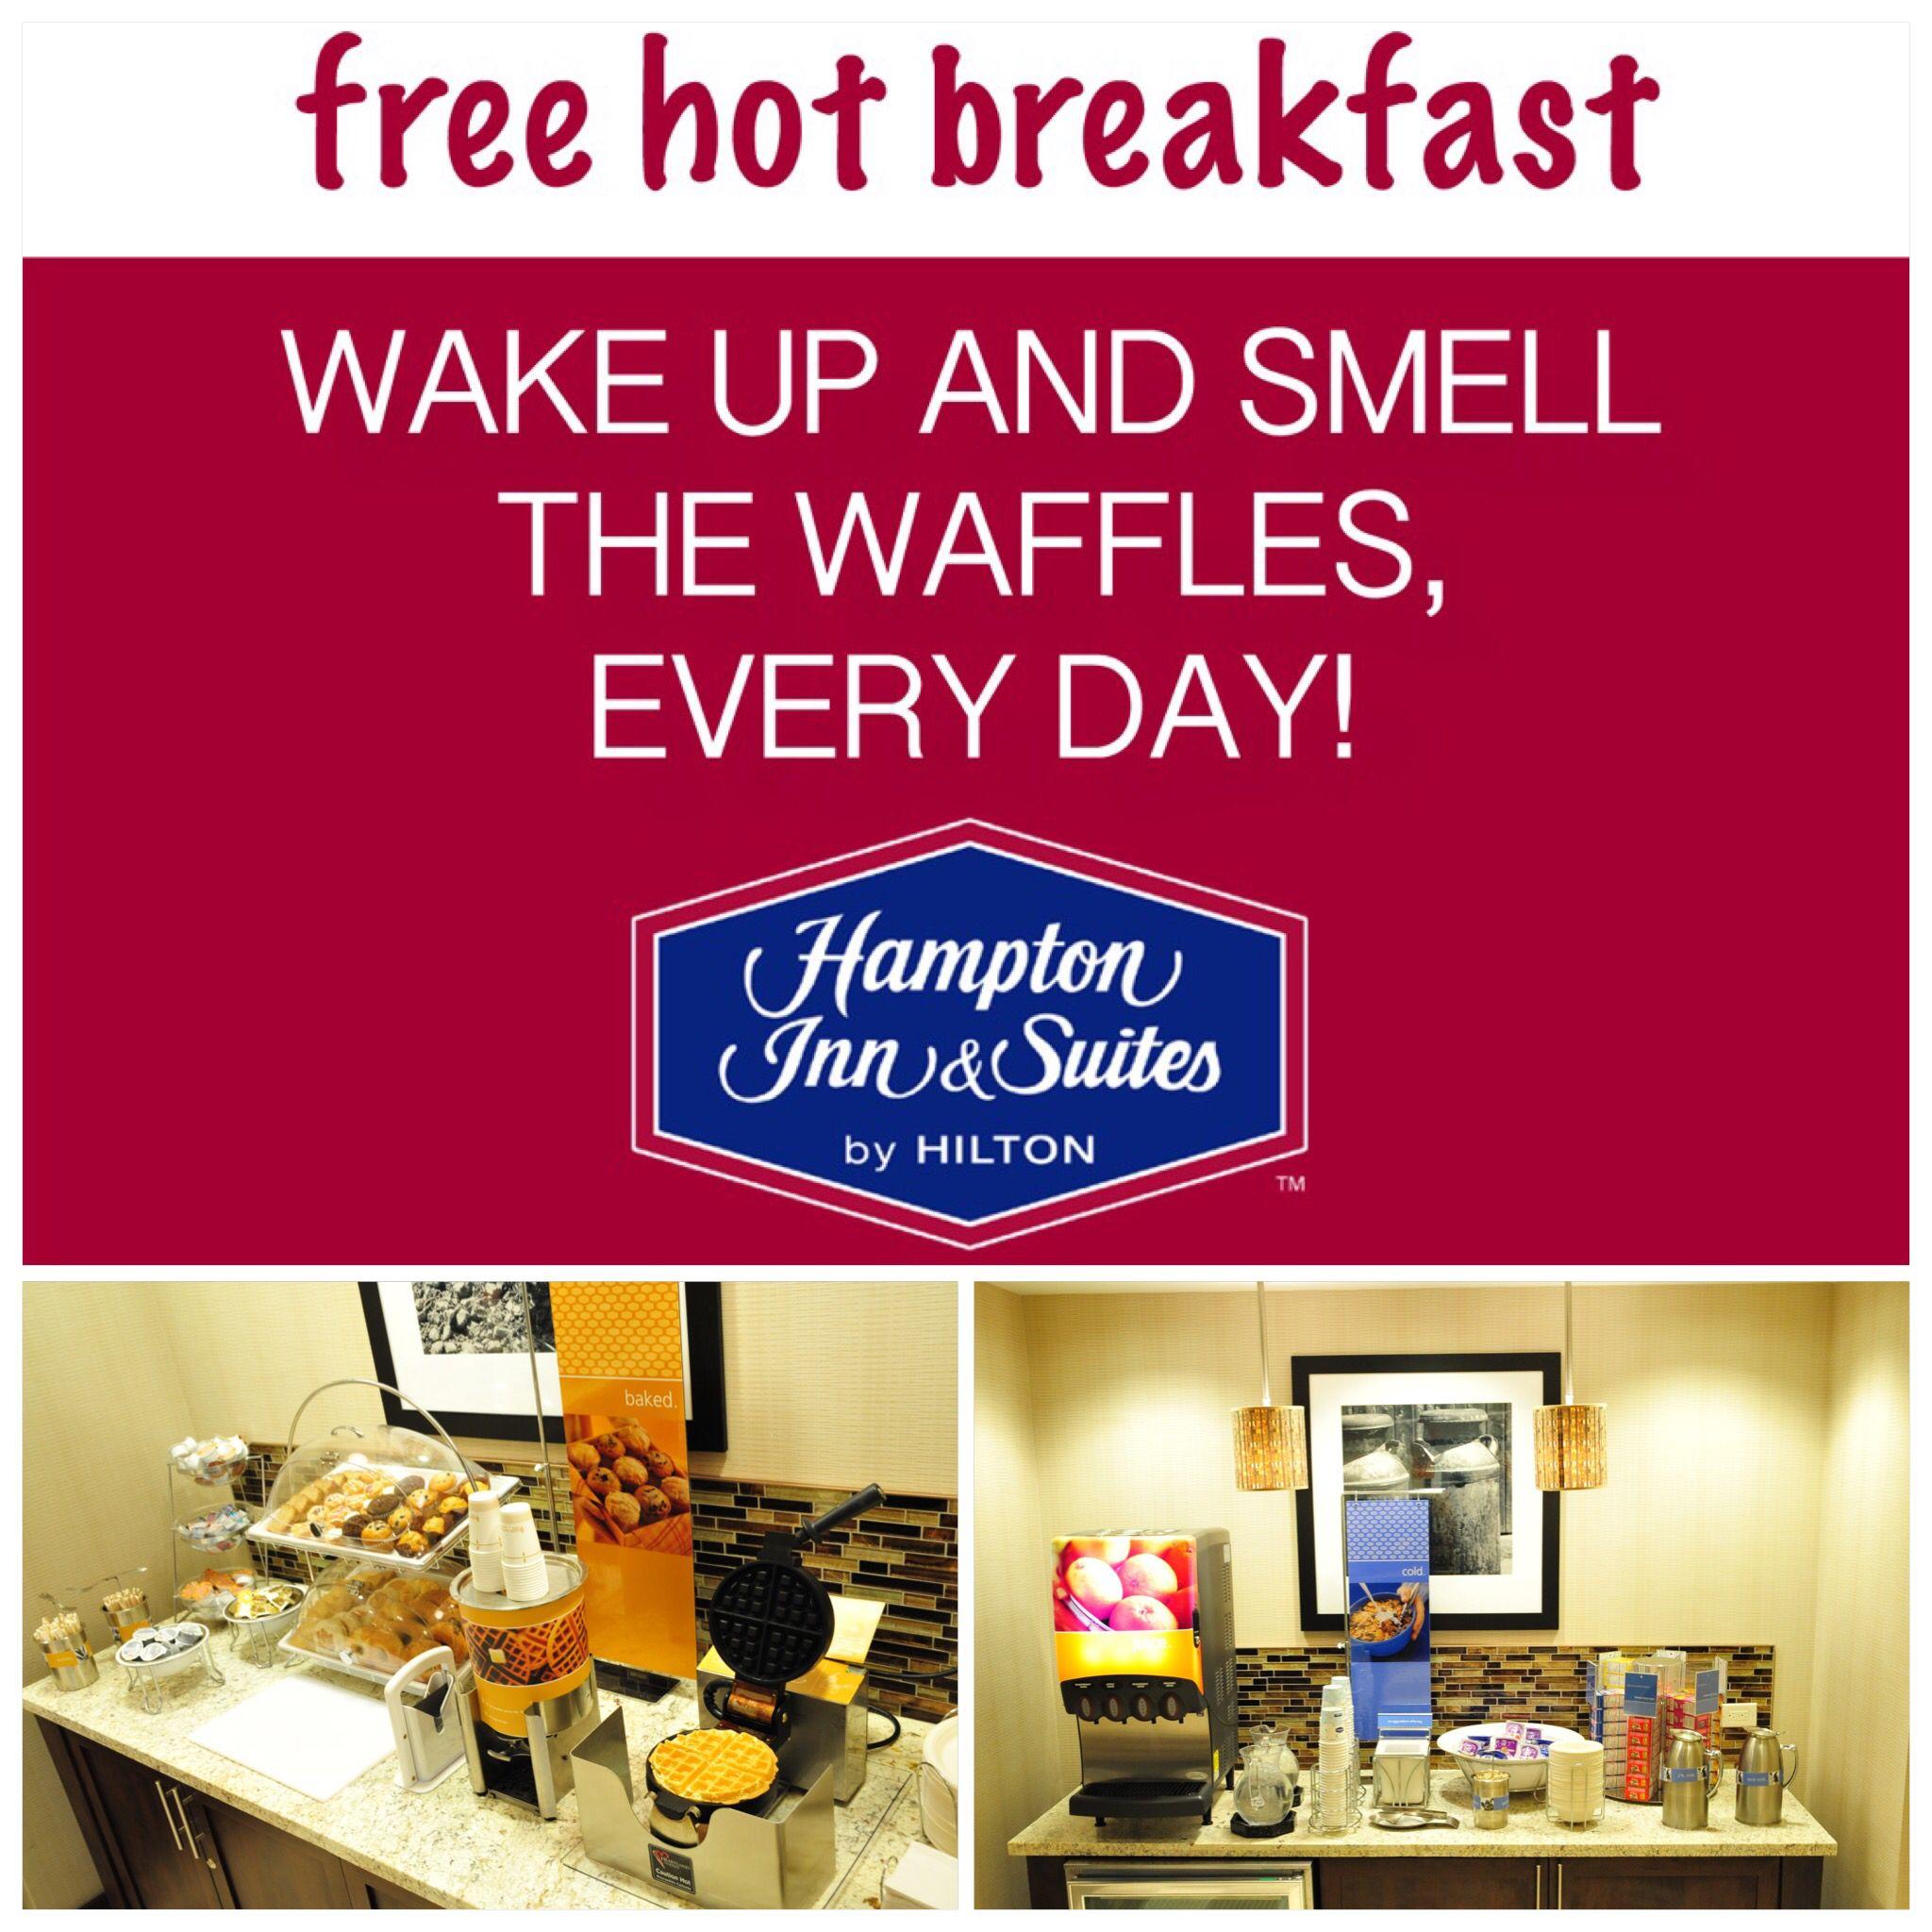 Enjoy A Complimentary Breakfast Every Morning At Hampton Inn